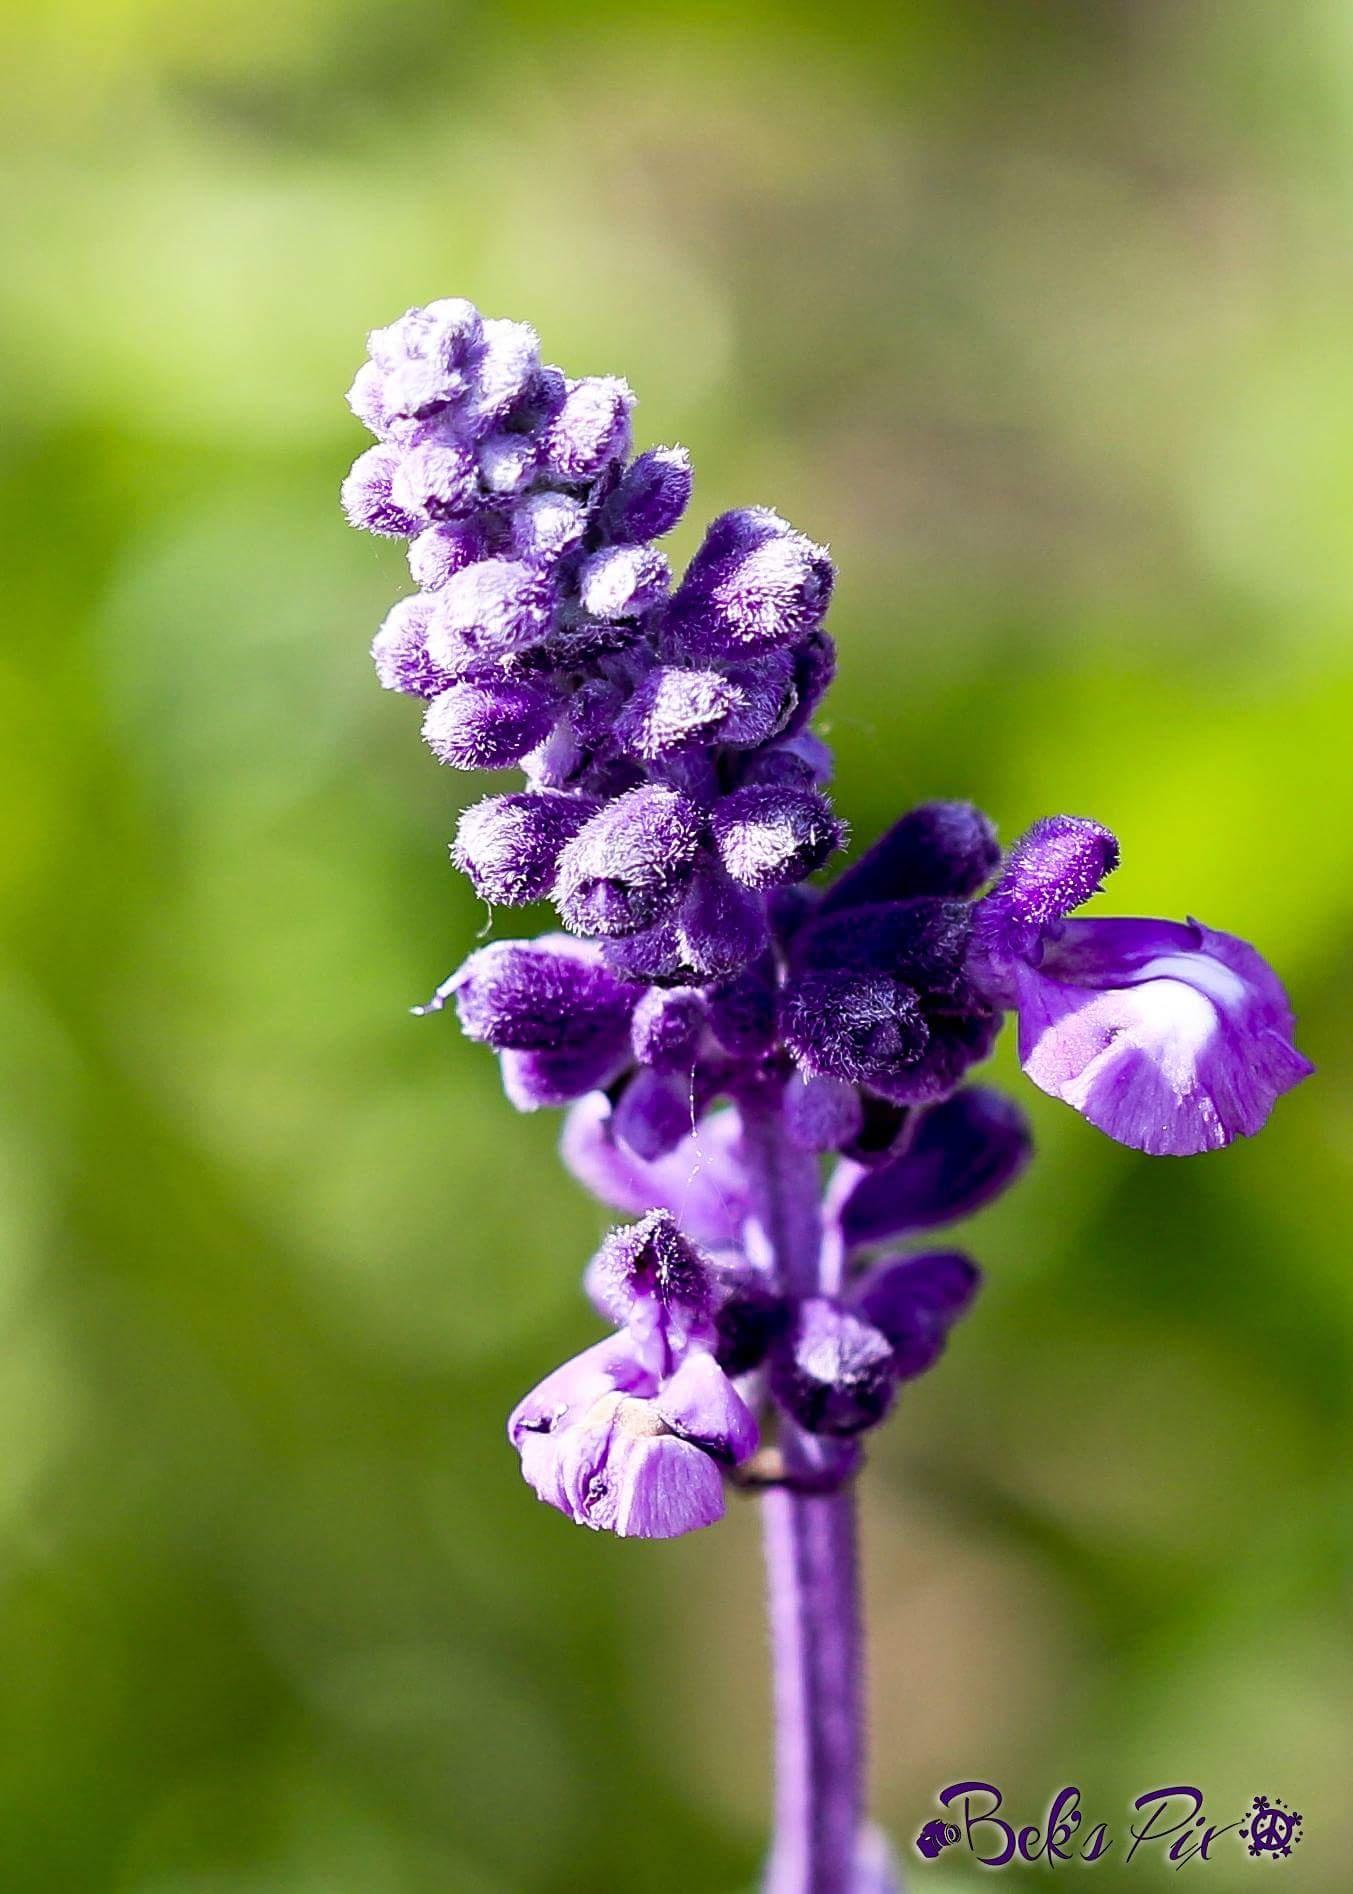 Gorgeous fuzzy purple bloom by Becky Dewey